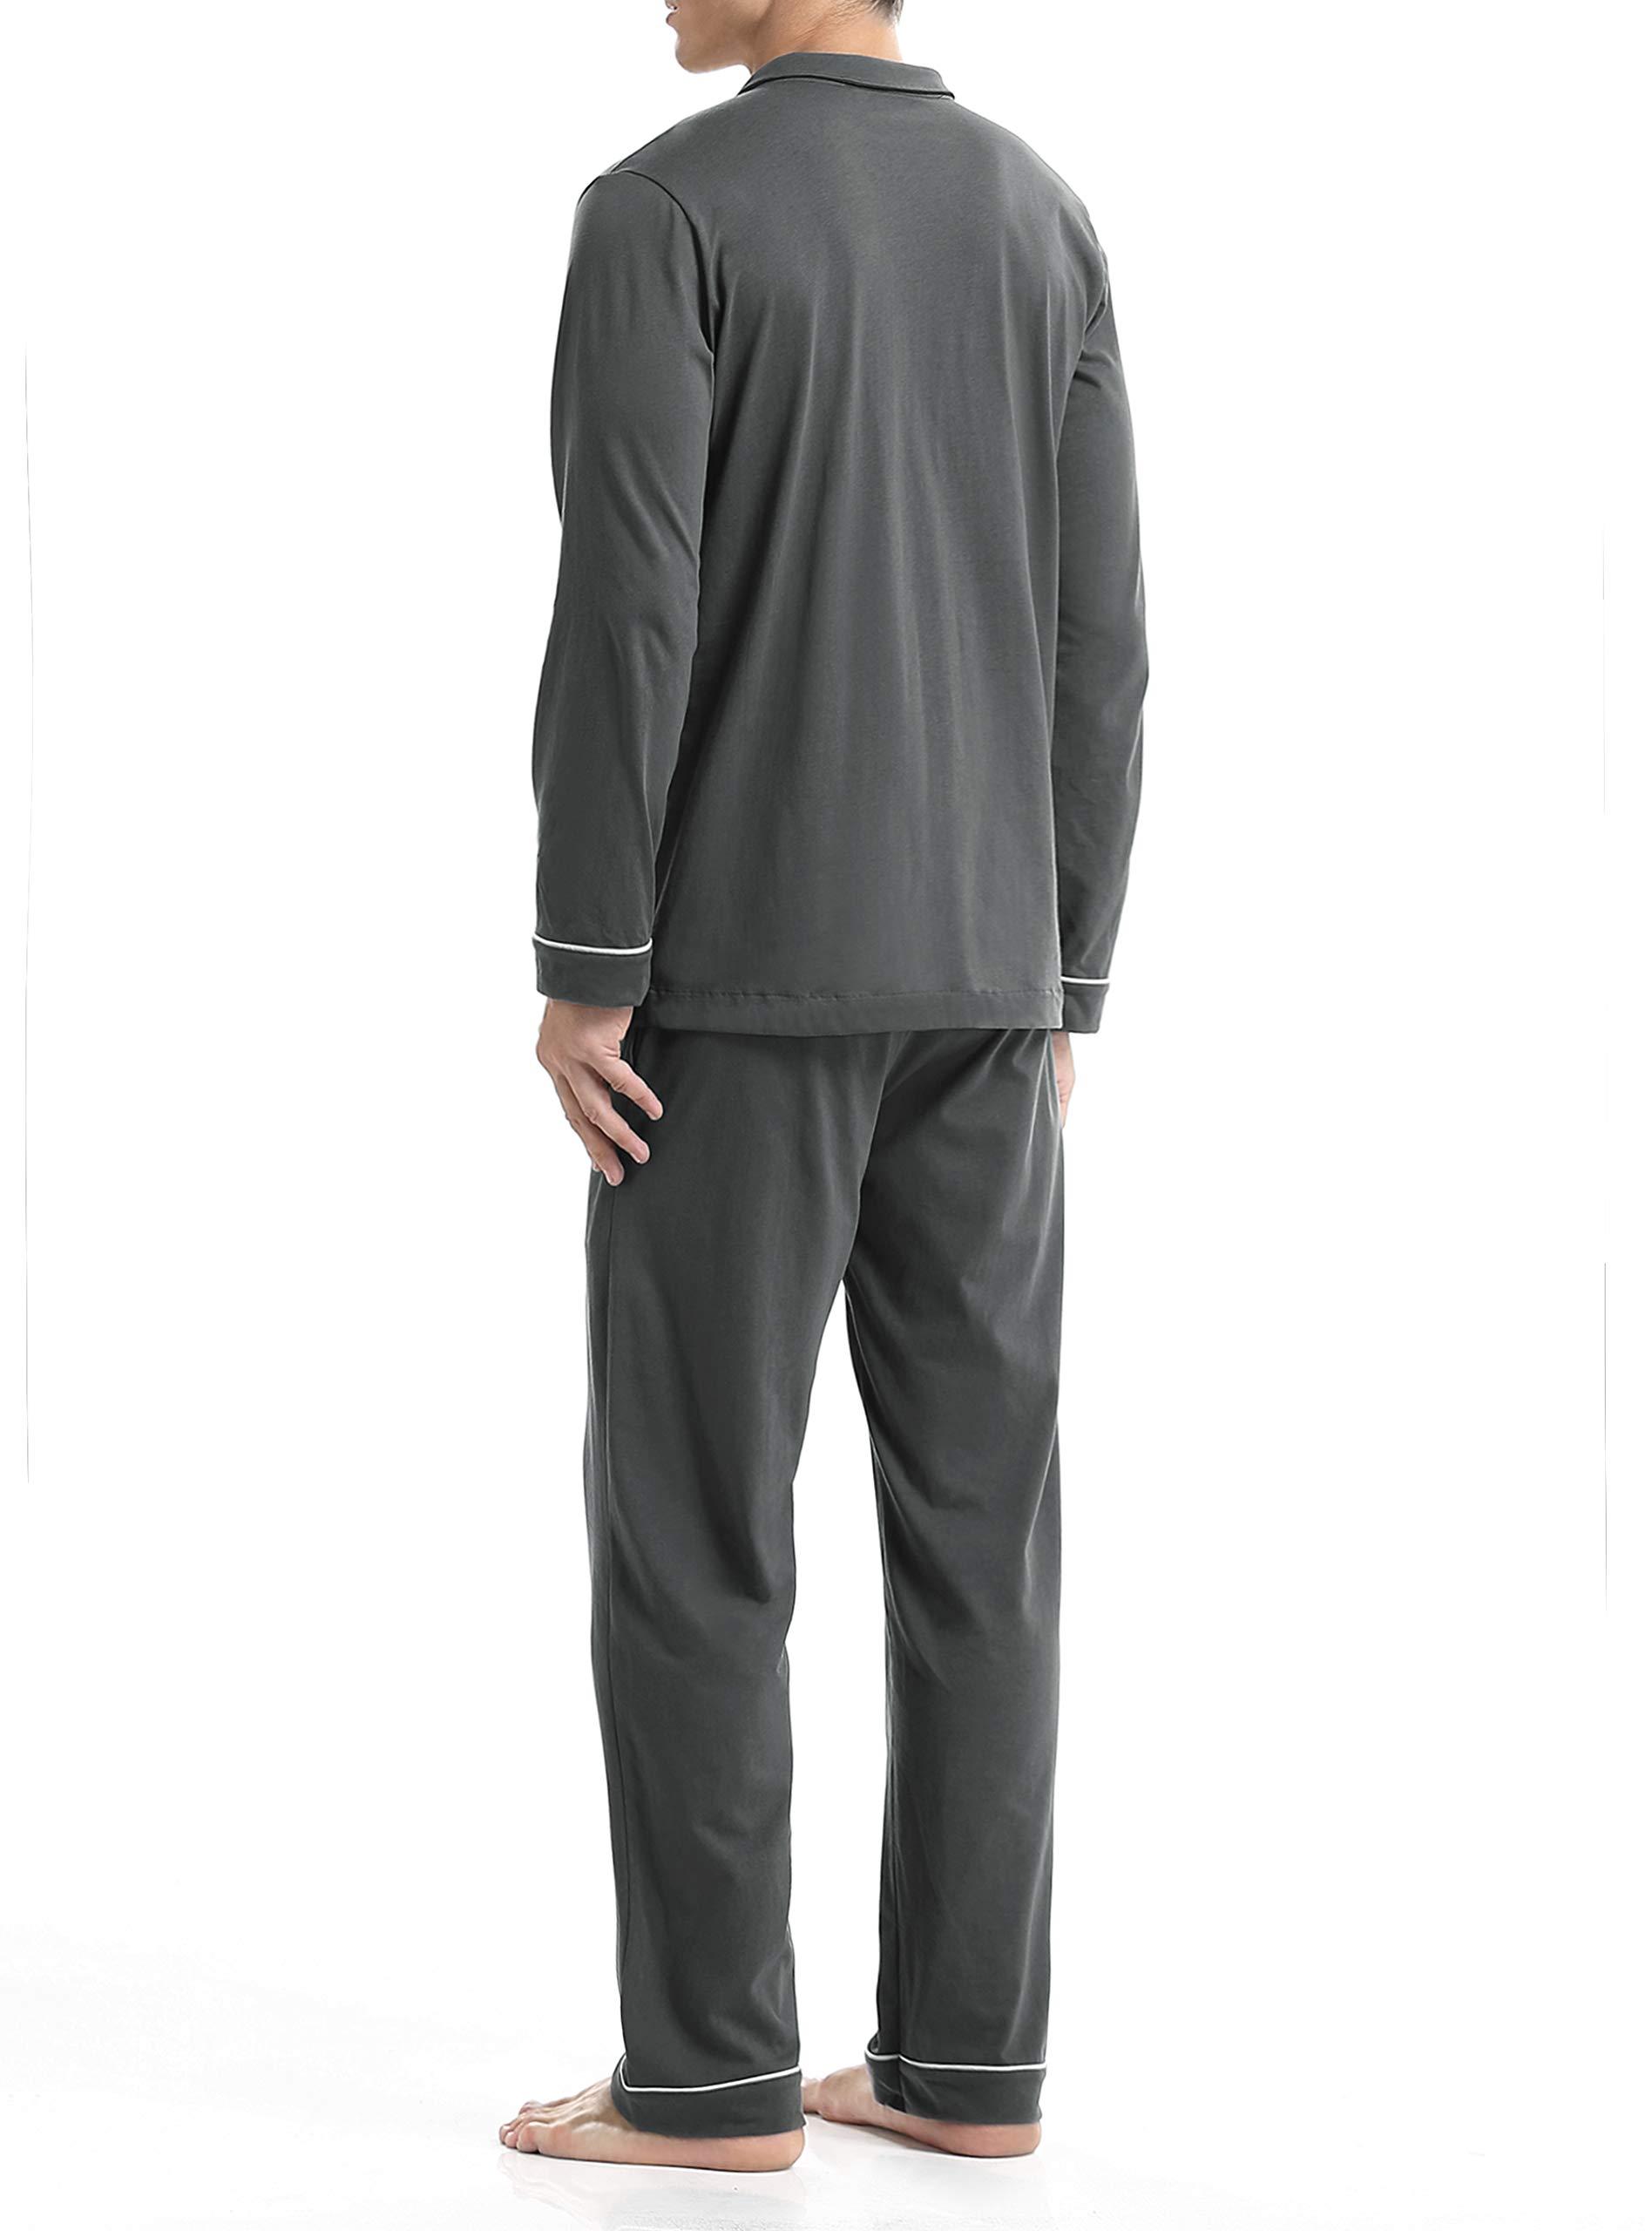 David Archy Men's 100% Cotton Long Button-Down Sleepwear Pajama Set (M, Dark Gray) by David Archy (Image #2)